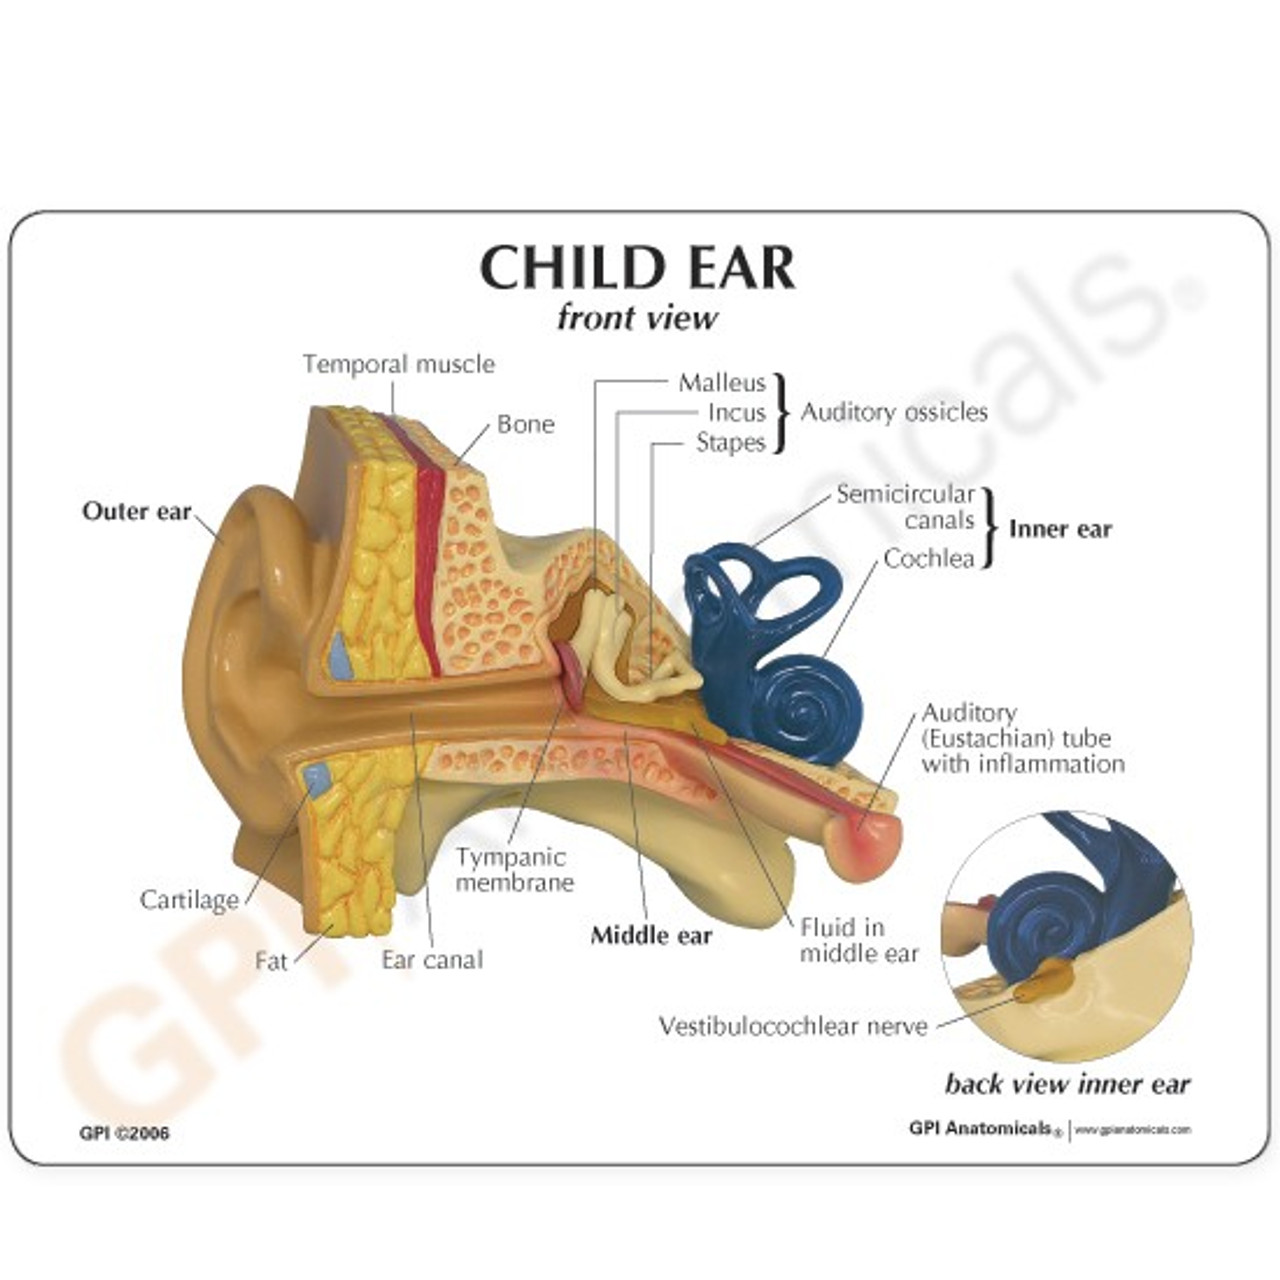 Ear Model Description Card